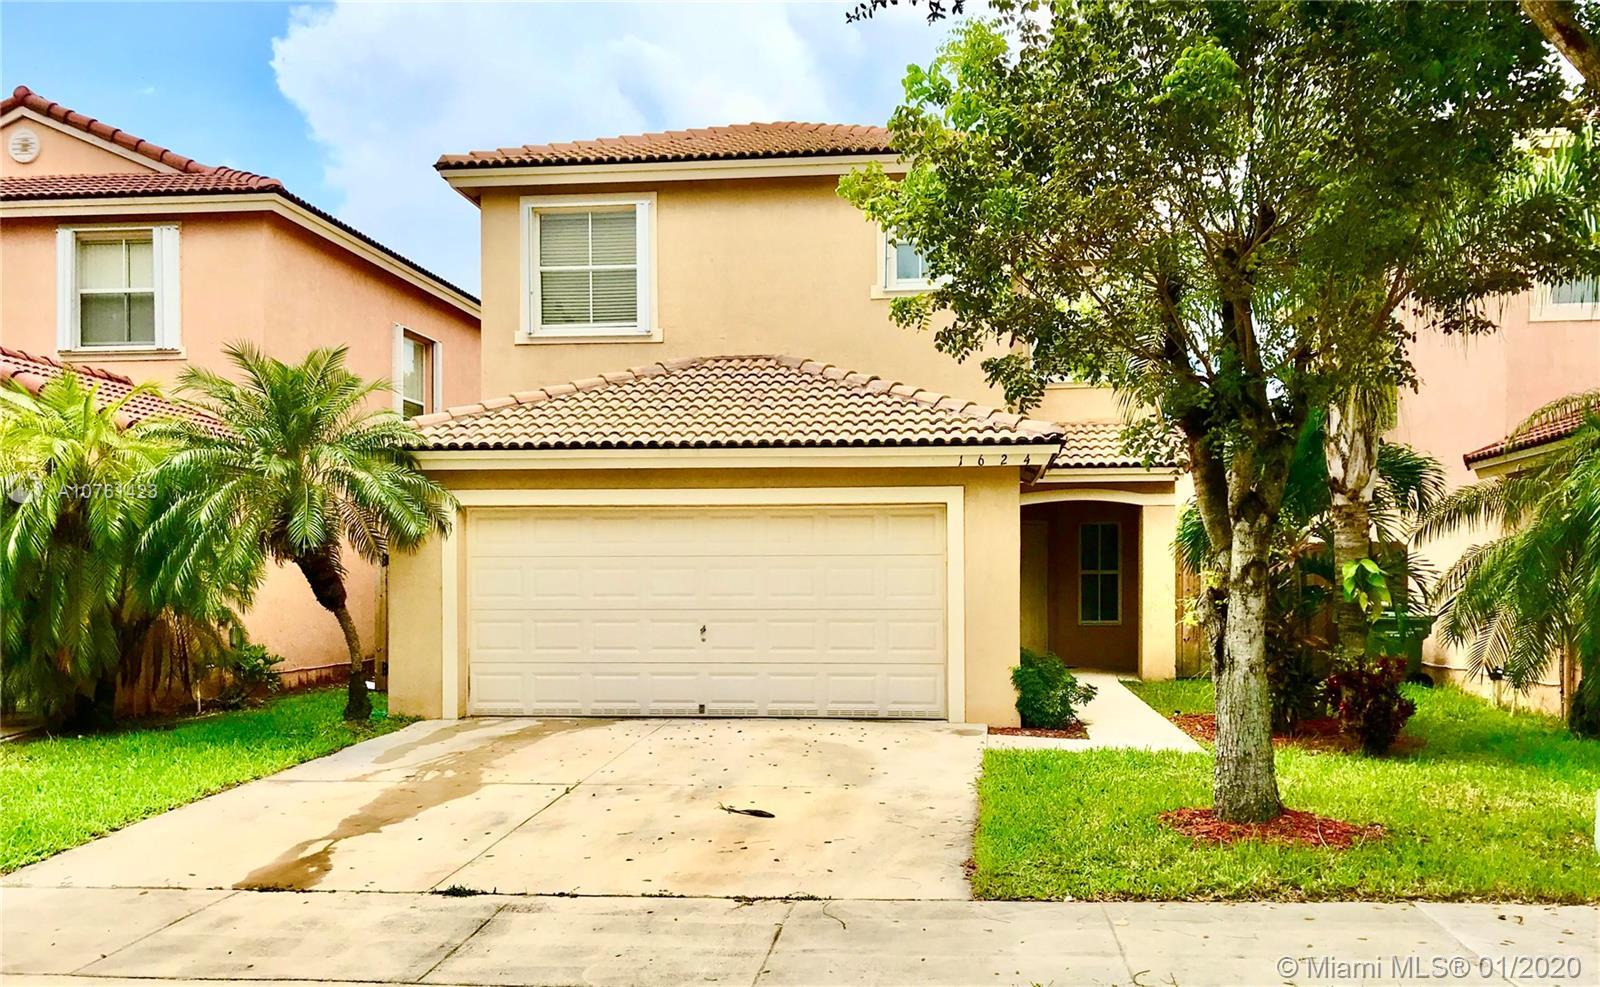 1624 SE 20th PL, Homestead, FL 33035 - Homestead, FL real estate listing